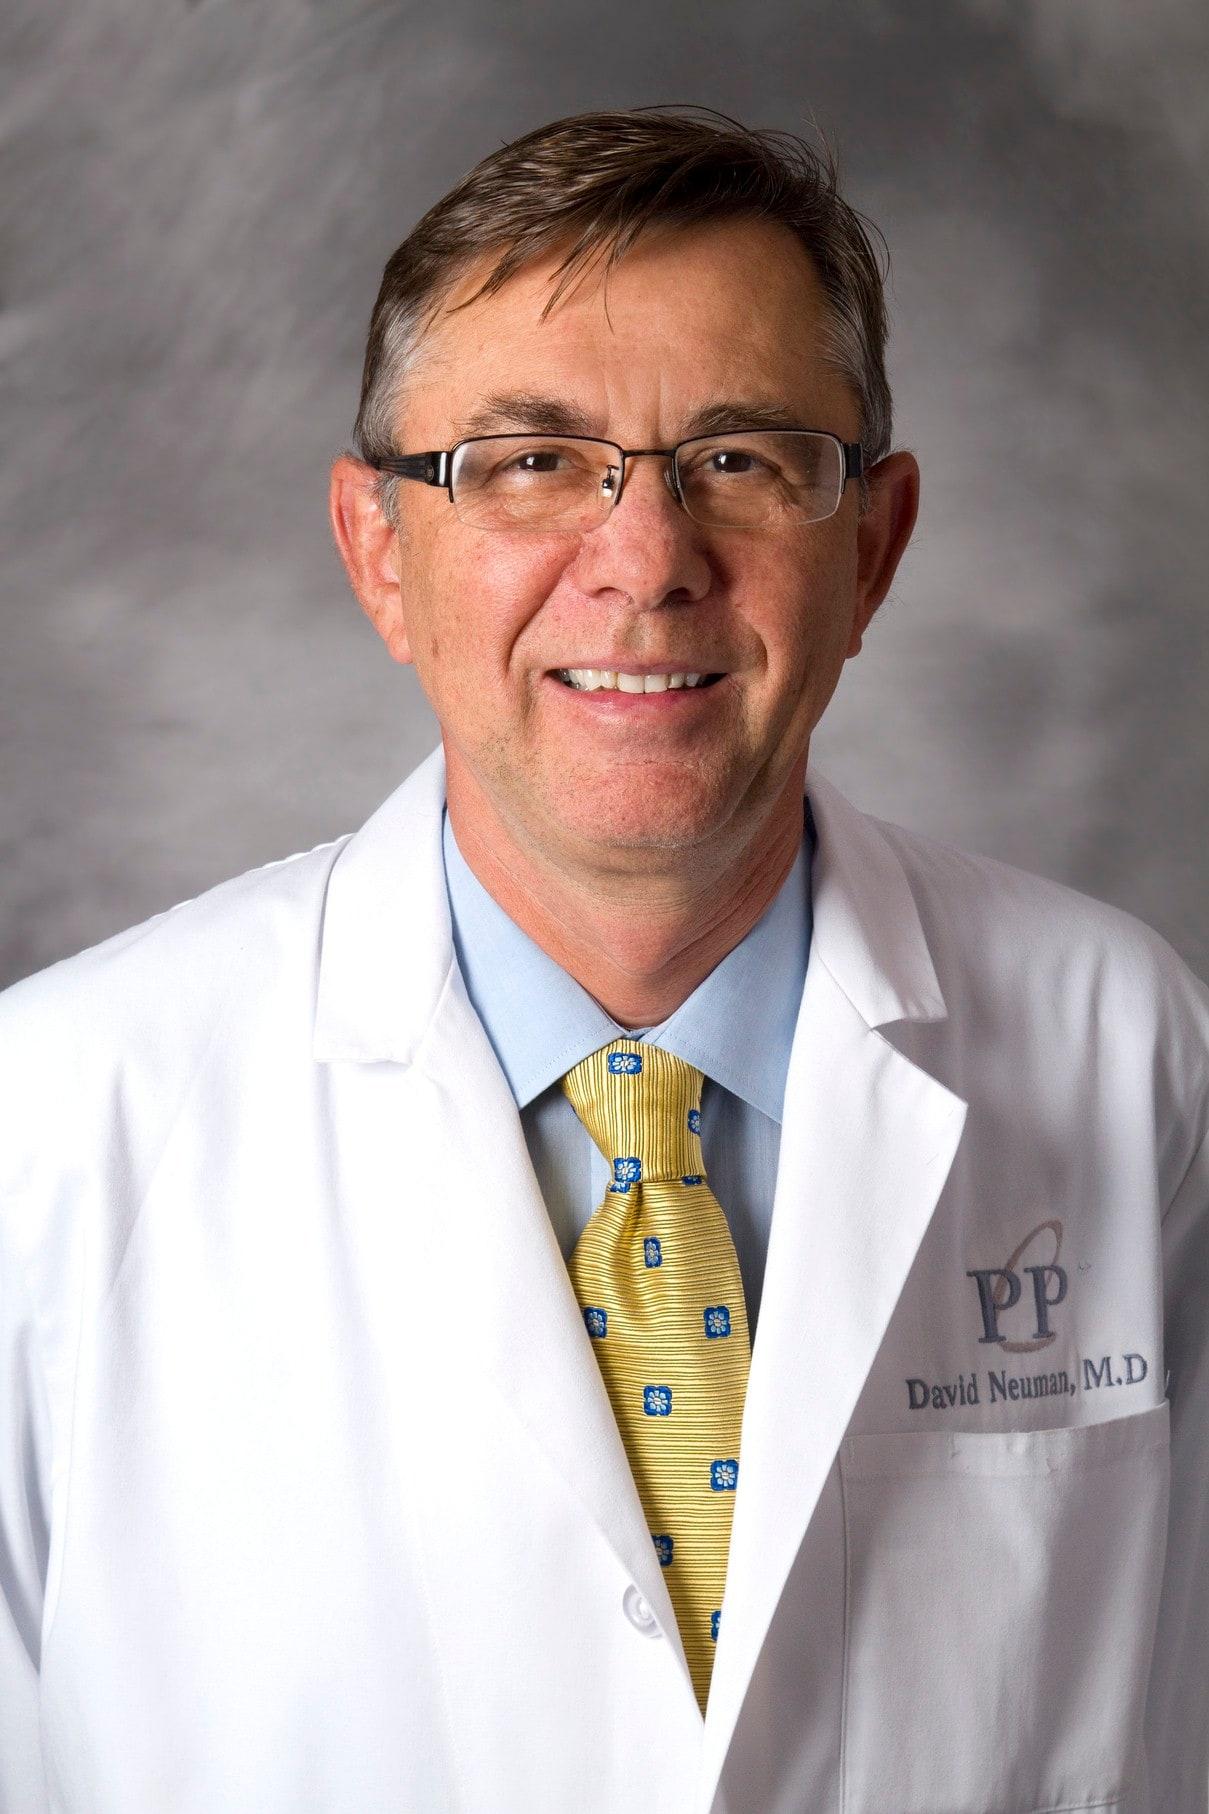 Dr. David Neuman MD